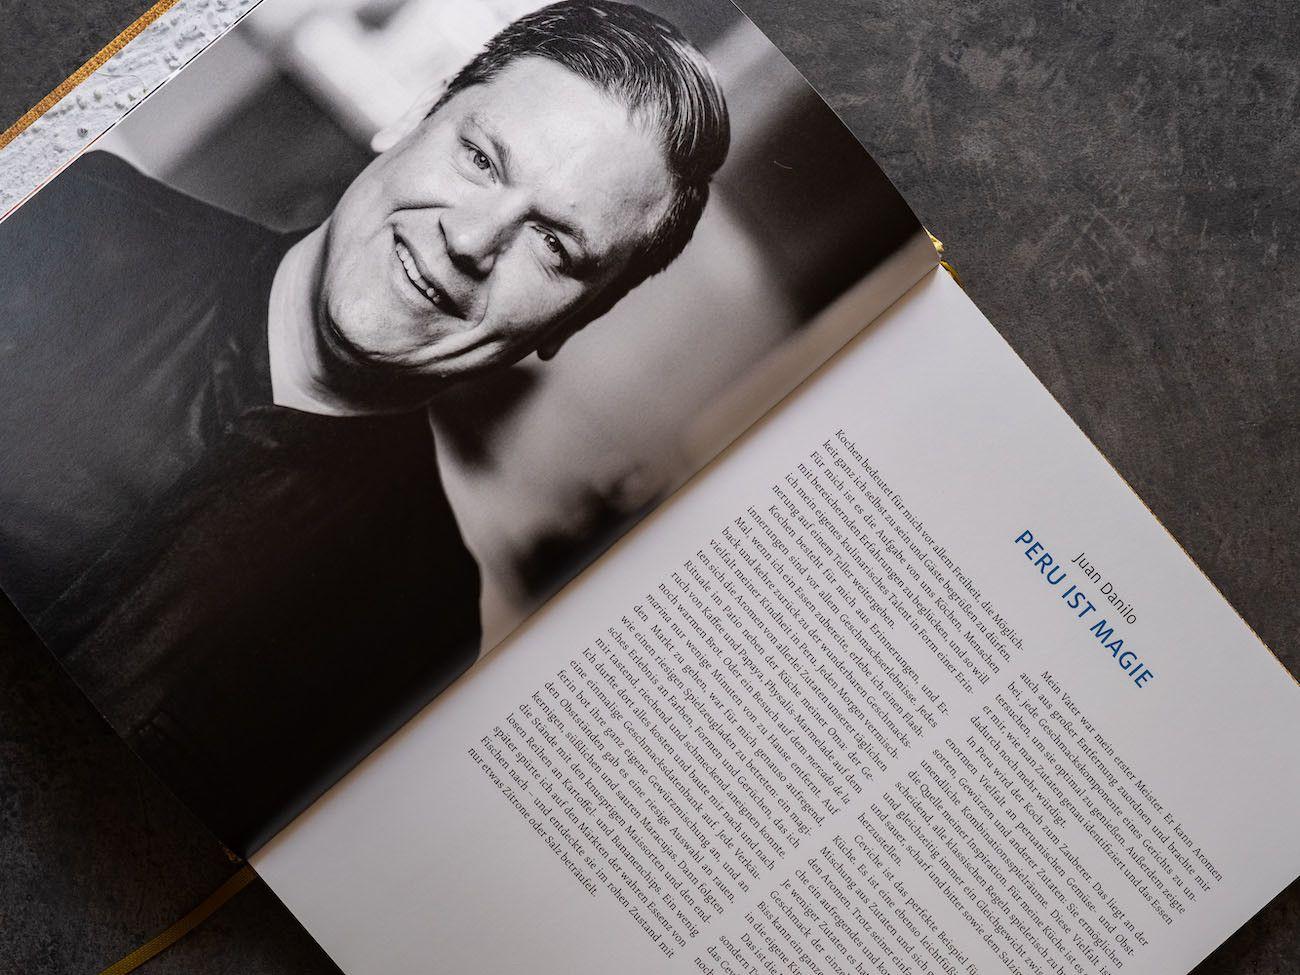 Foodblog, About Fuel, CEVICHE Das Kochbuch, Juan Danilo, Portrait, Peru ist Magie